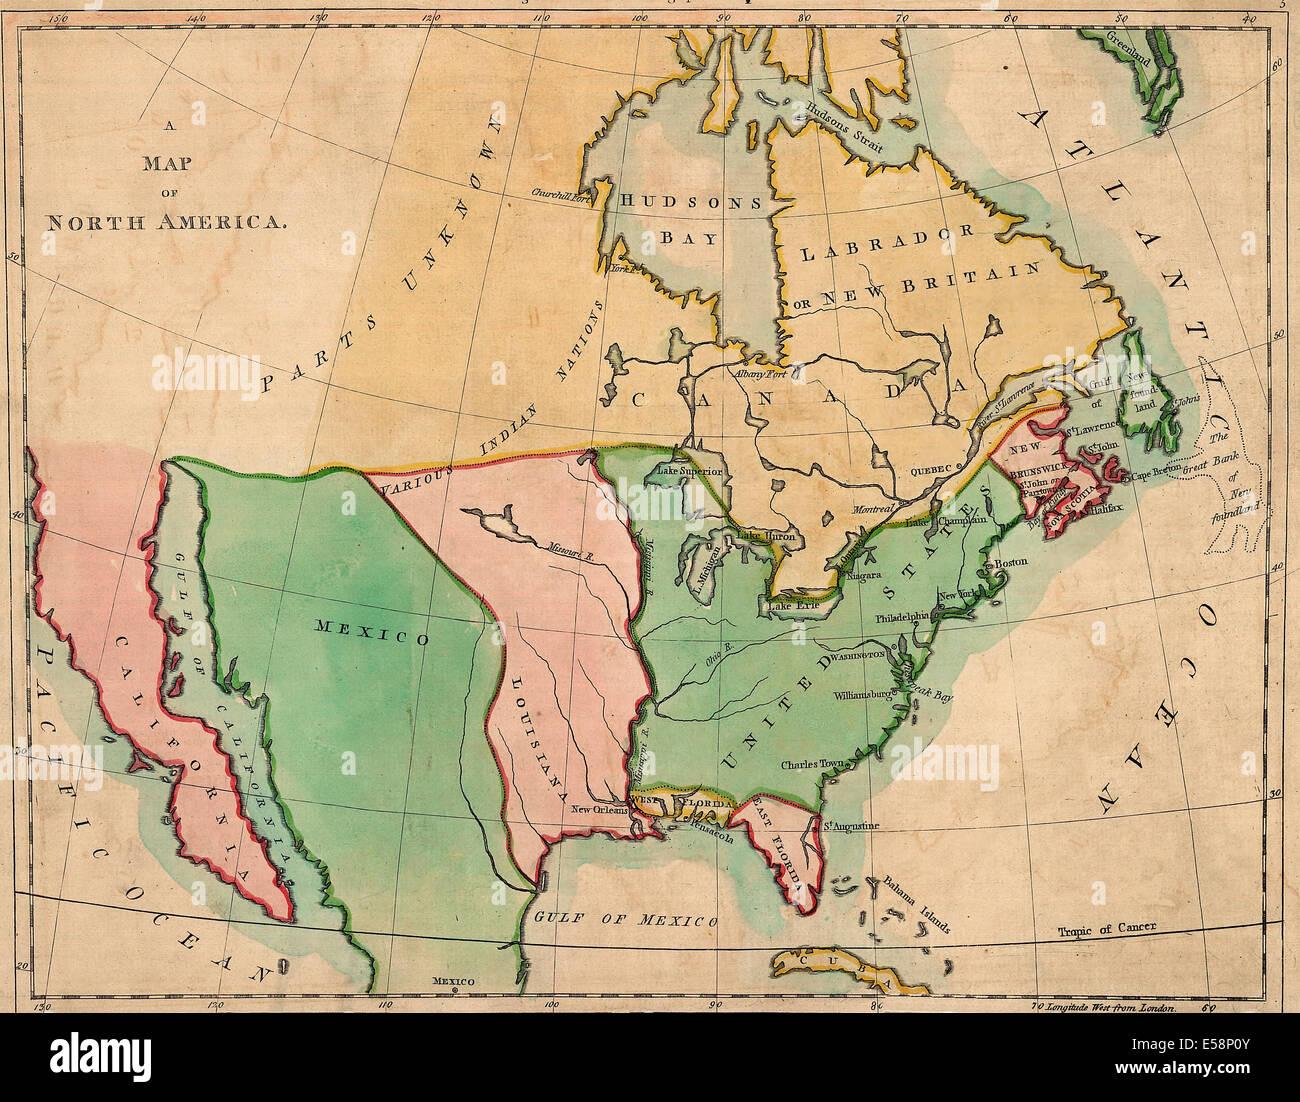 North America Russia Map%0A United States Map East Coast Outline A map of North America Outline of North  America in